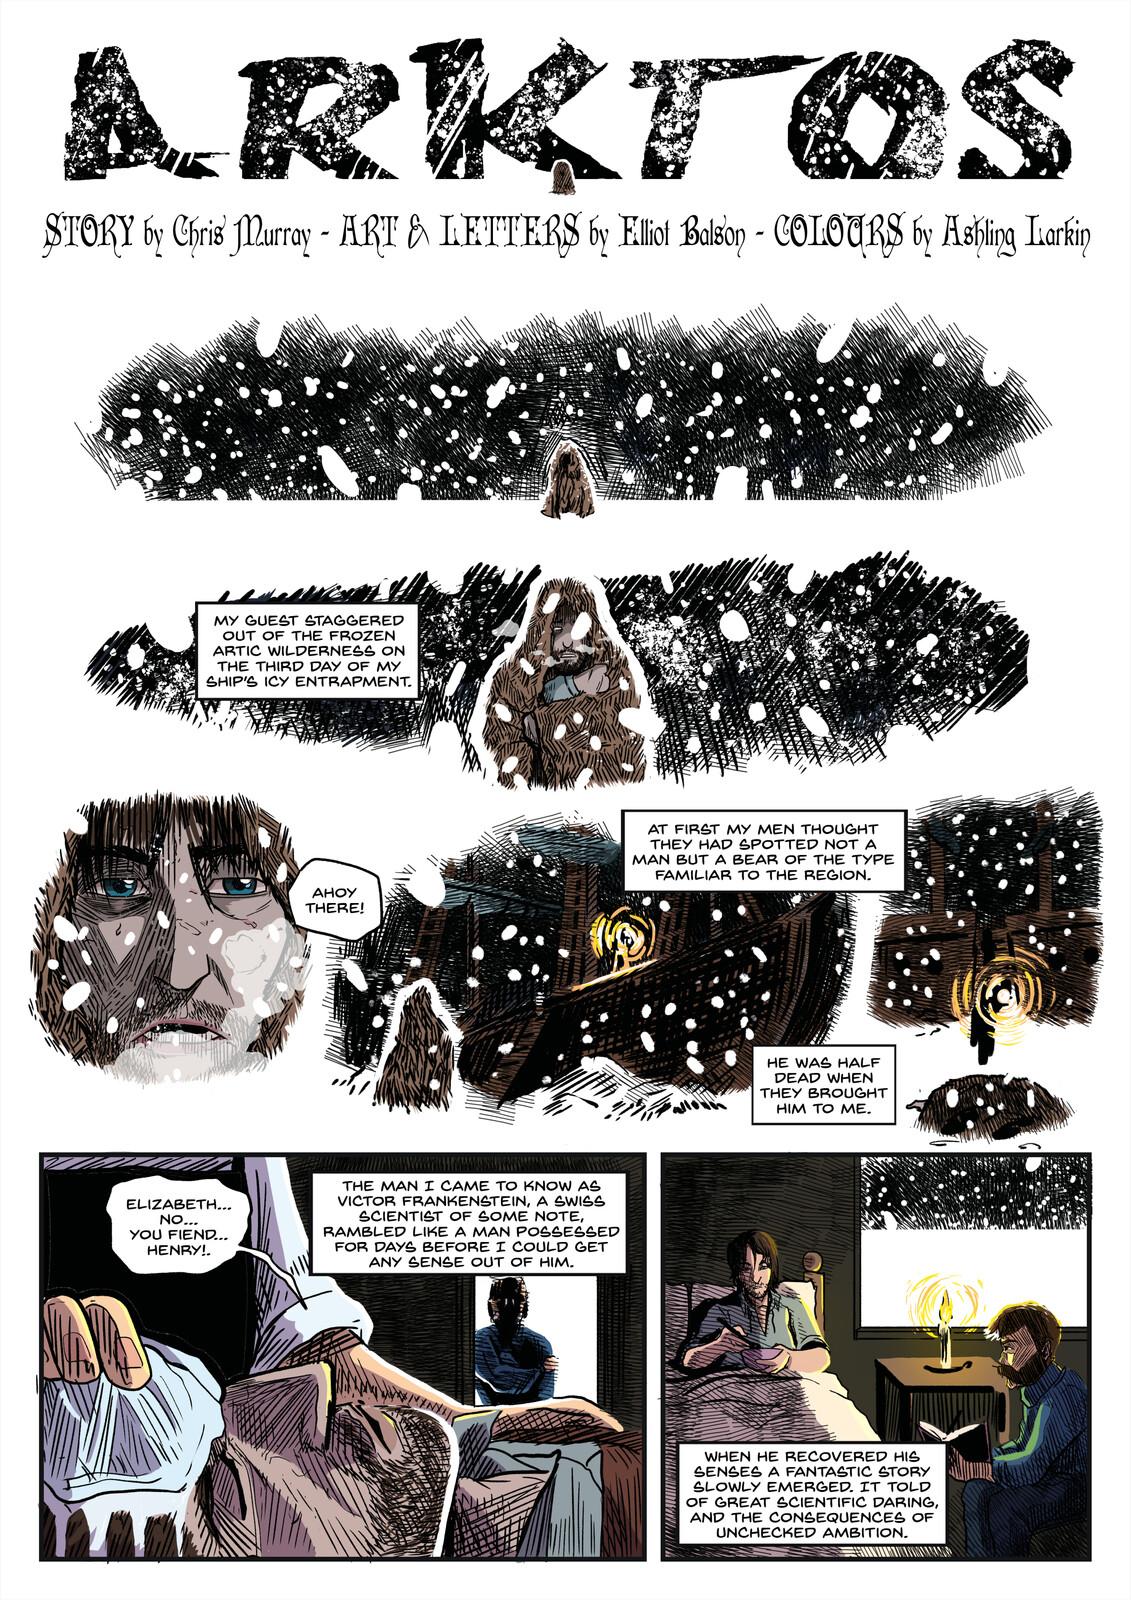 Page 1 Colours (Ashling Larkin)